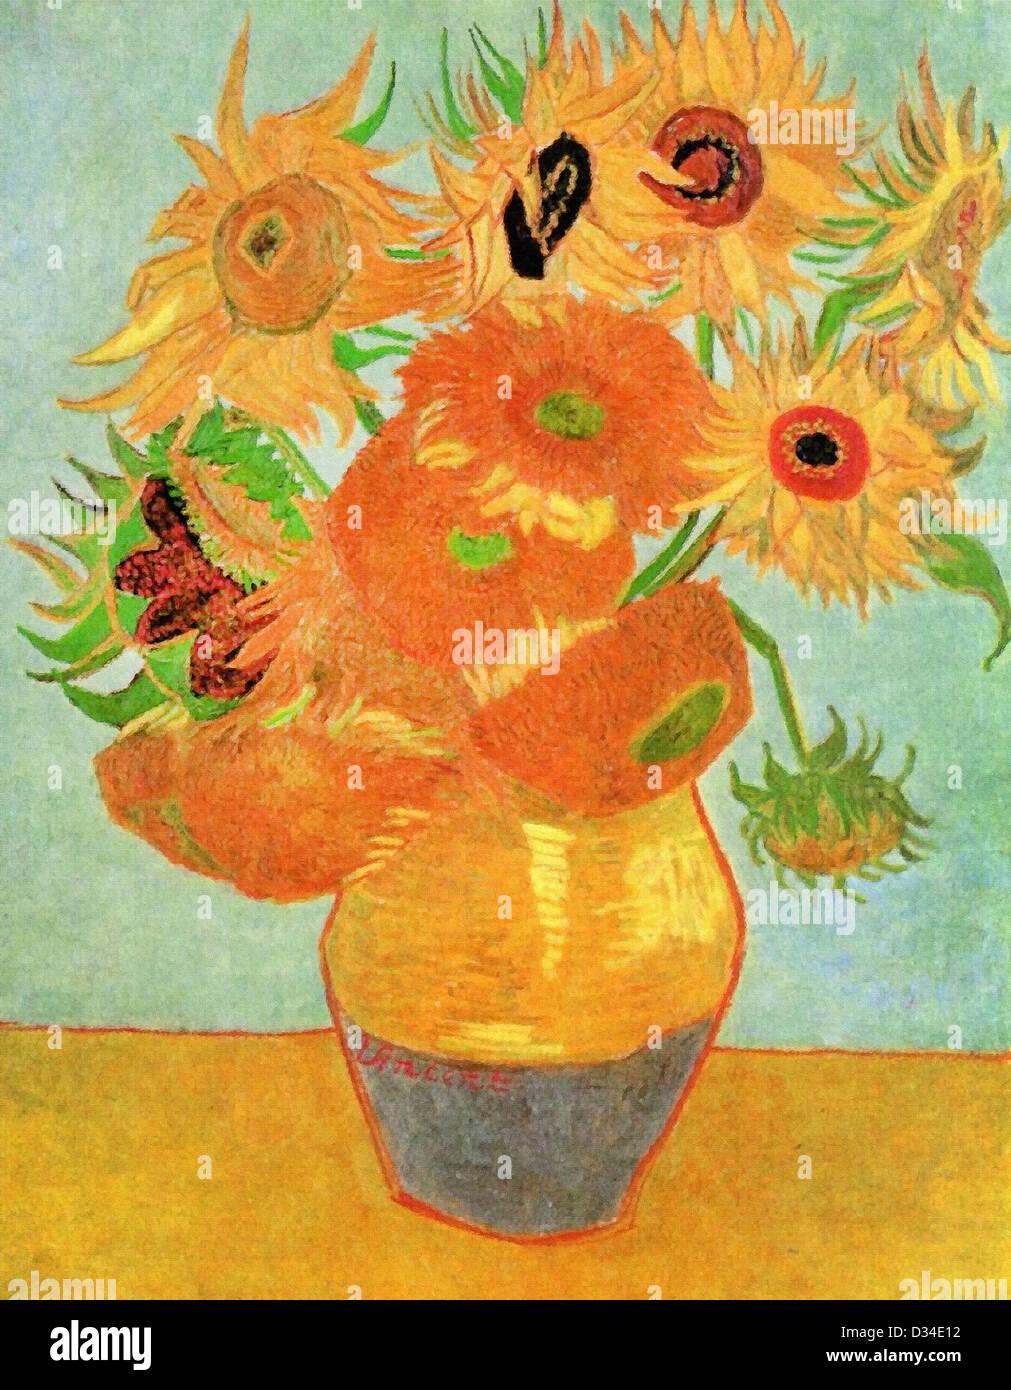 Vincent van gogh still life vase with twelve sunflowers 1889 vincent van gogh still life vase with twelve sunflowers 1889 post impressionism oil on canvas philadelphia museum of art reviewsmspy